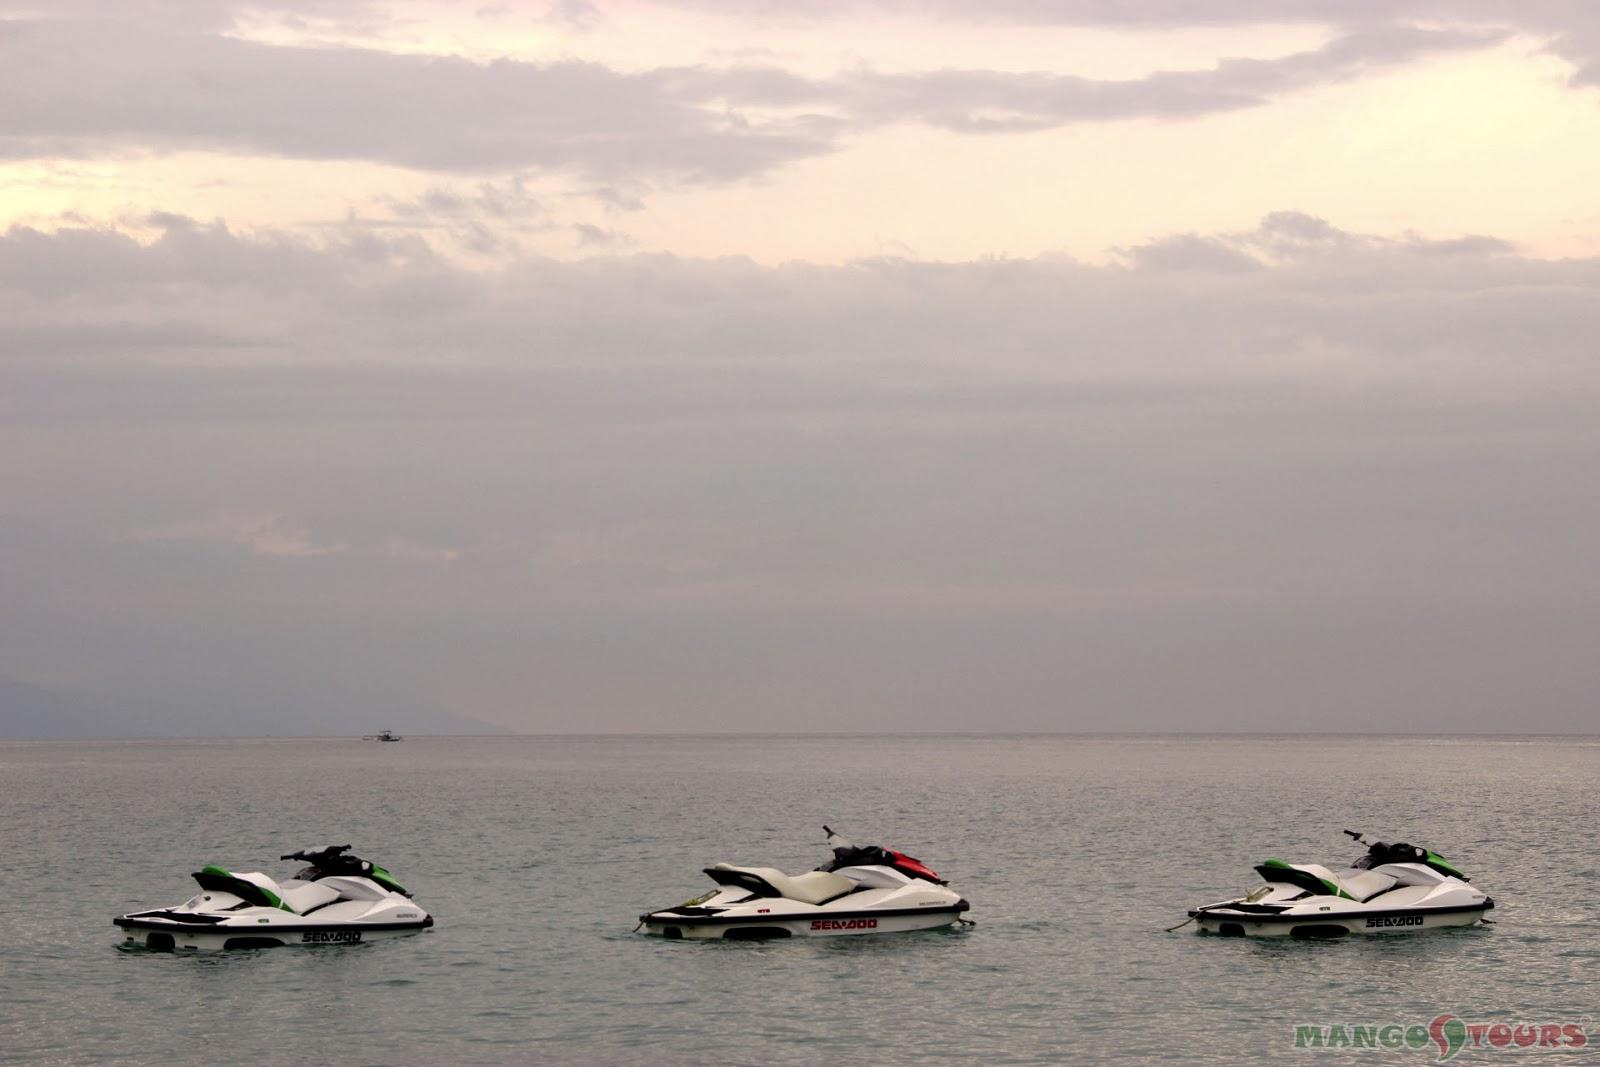 Puerto Galera Buri Resort & Spa Restaurant Mango Tours Philippines Jet ski water sport activities